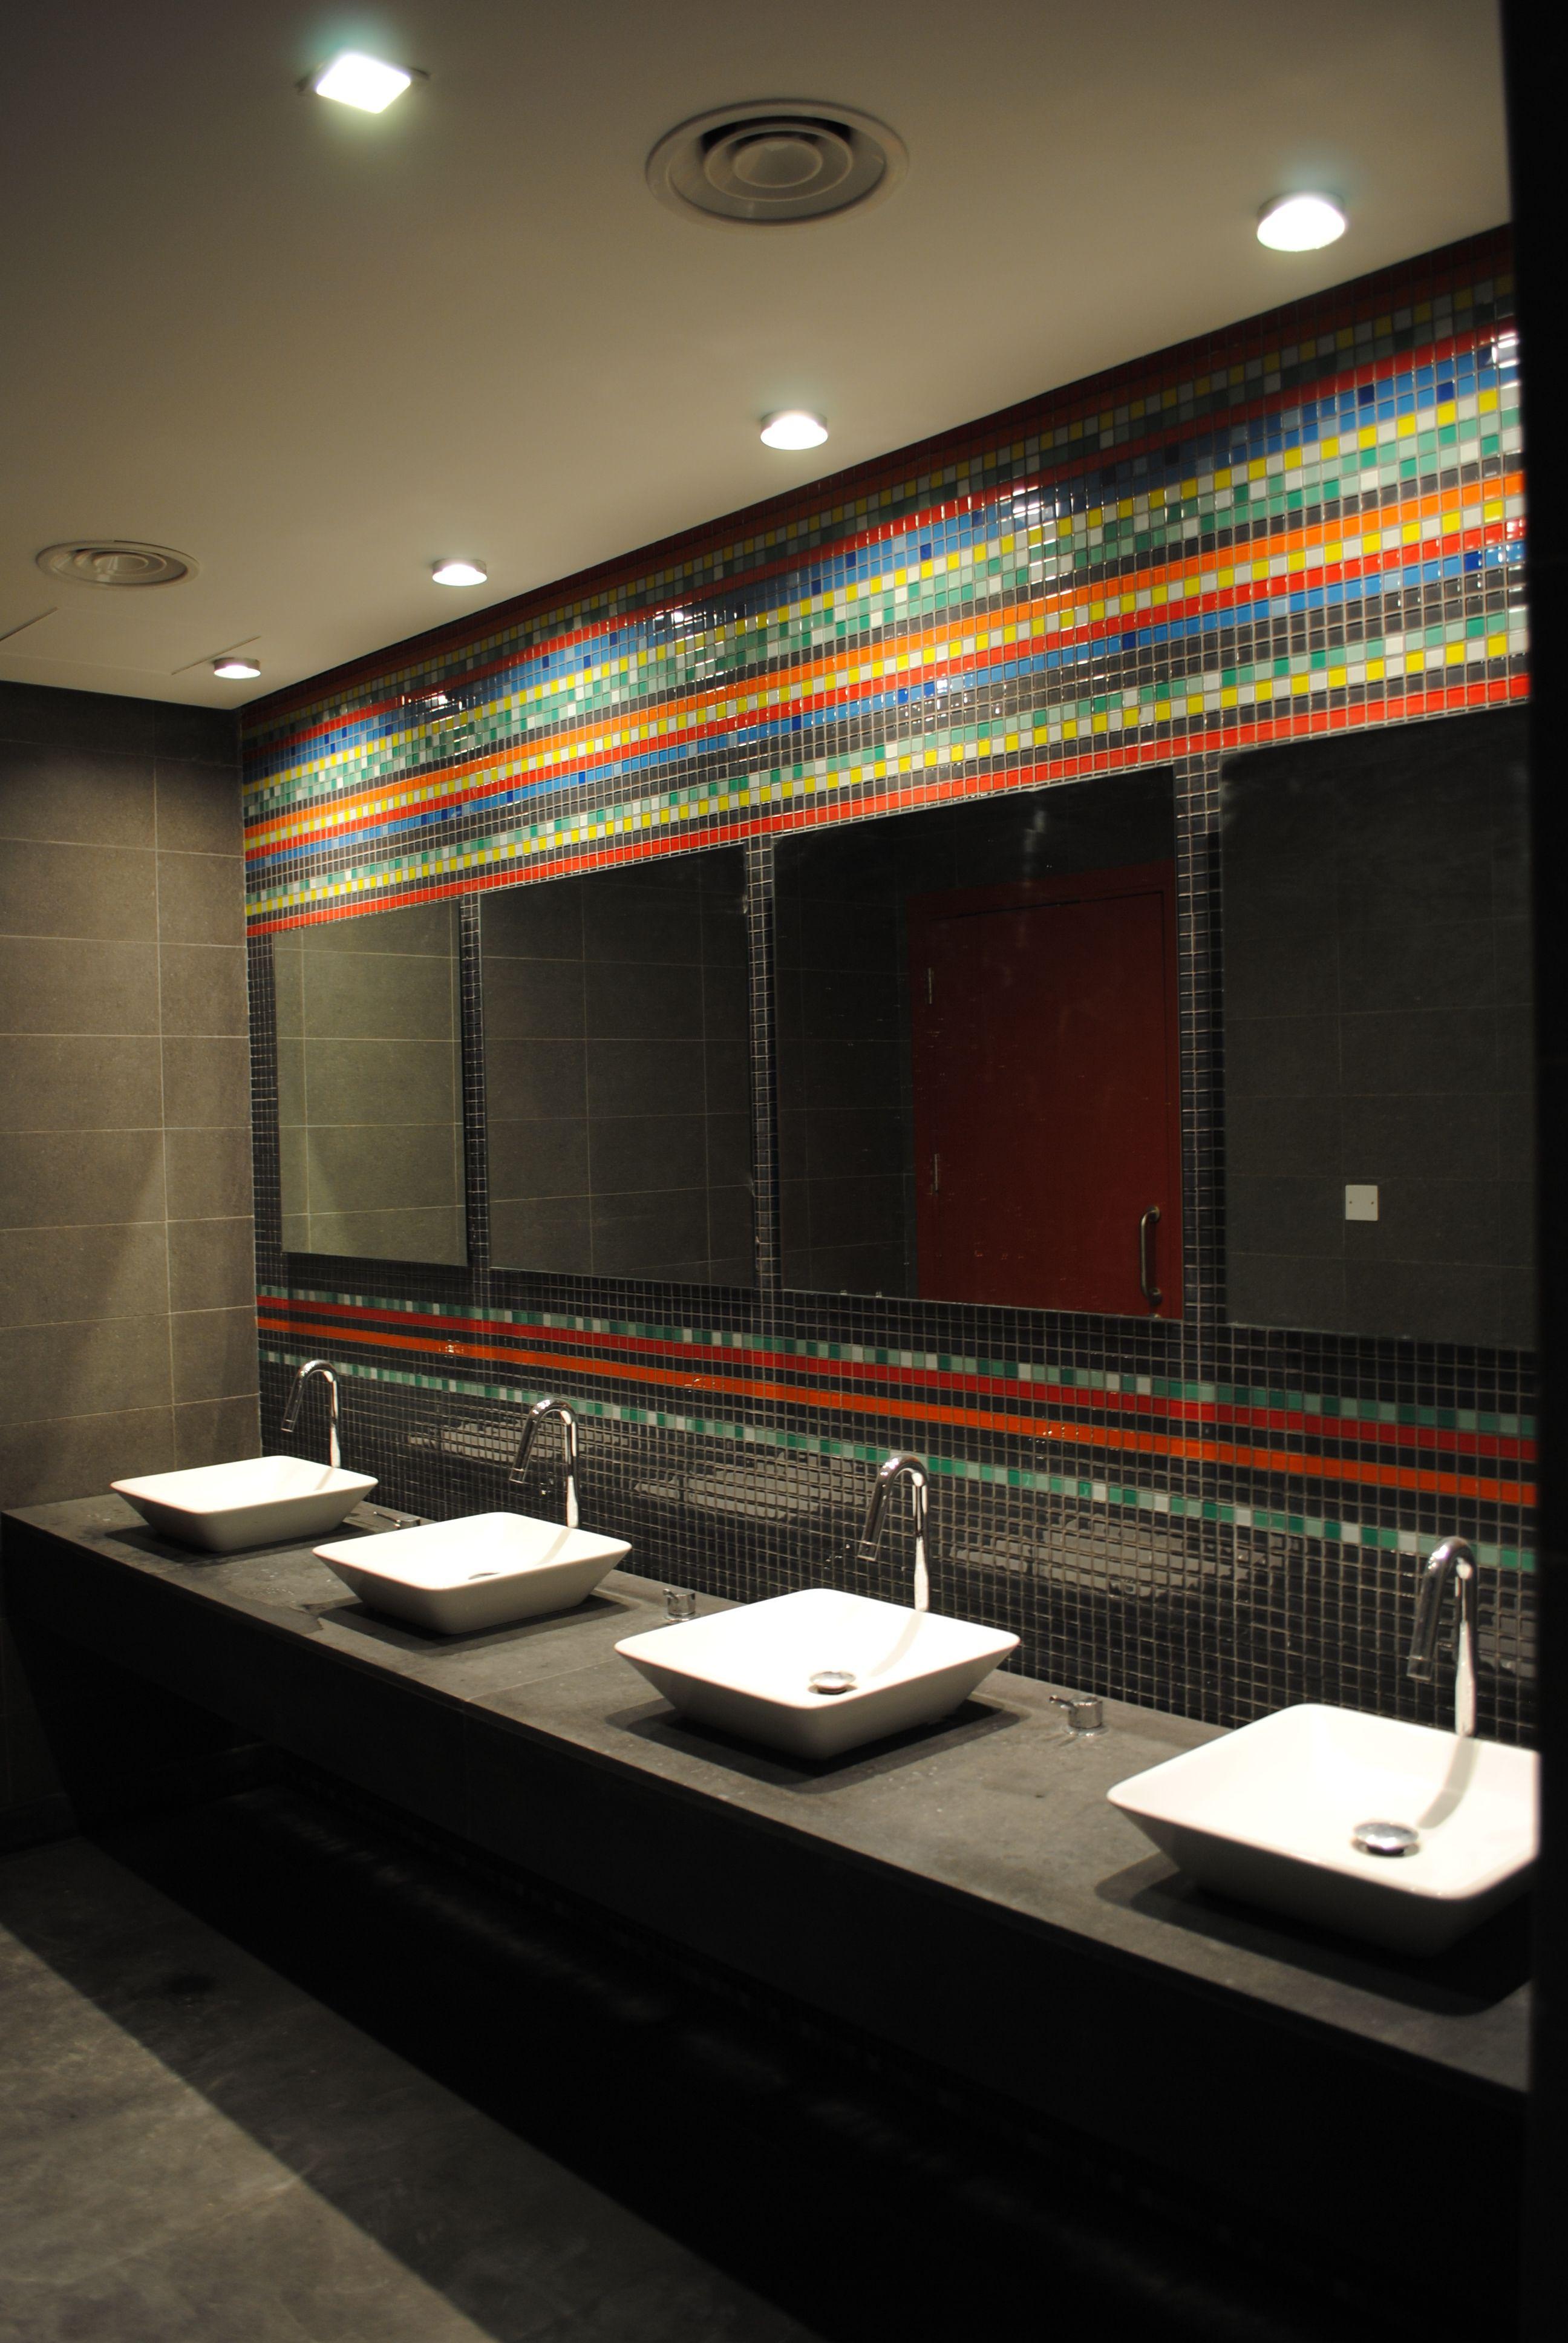 Hues Public Toilet Bathroom Lighting Design Restroom Design Toilet Design Bathroom lights ideas png